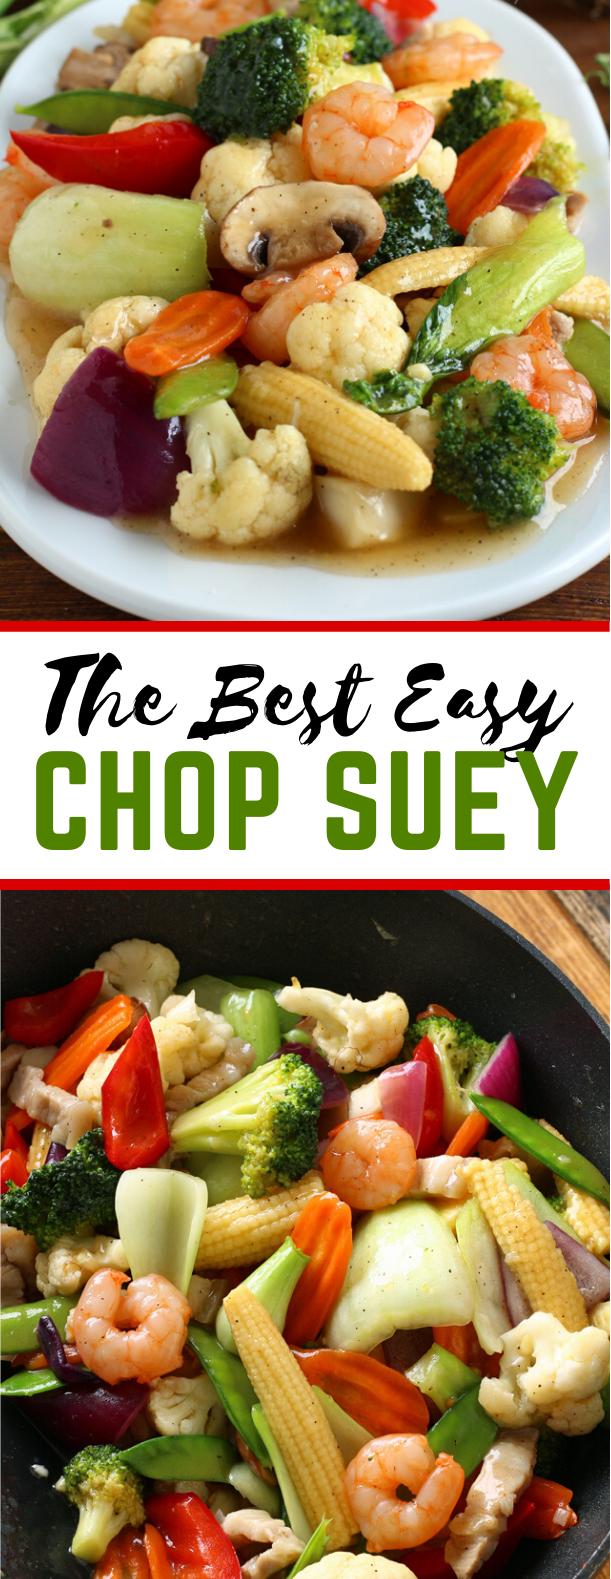 Easy Chop Suey Recipe #vegetables #asianfood #easyrecipe #veggies #vegetarian